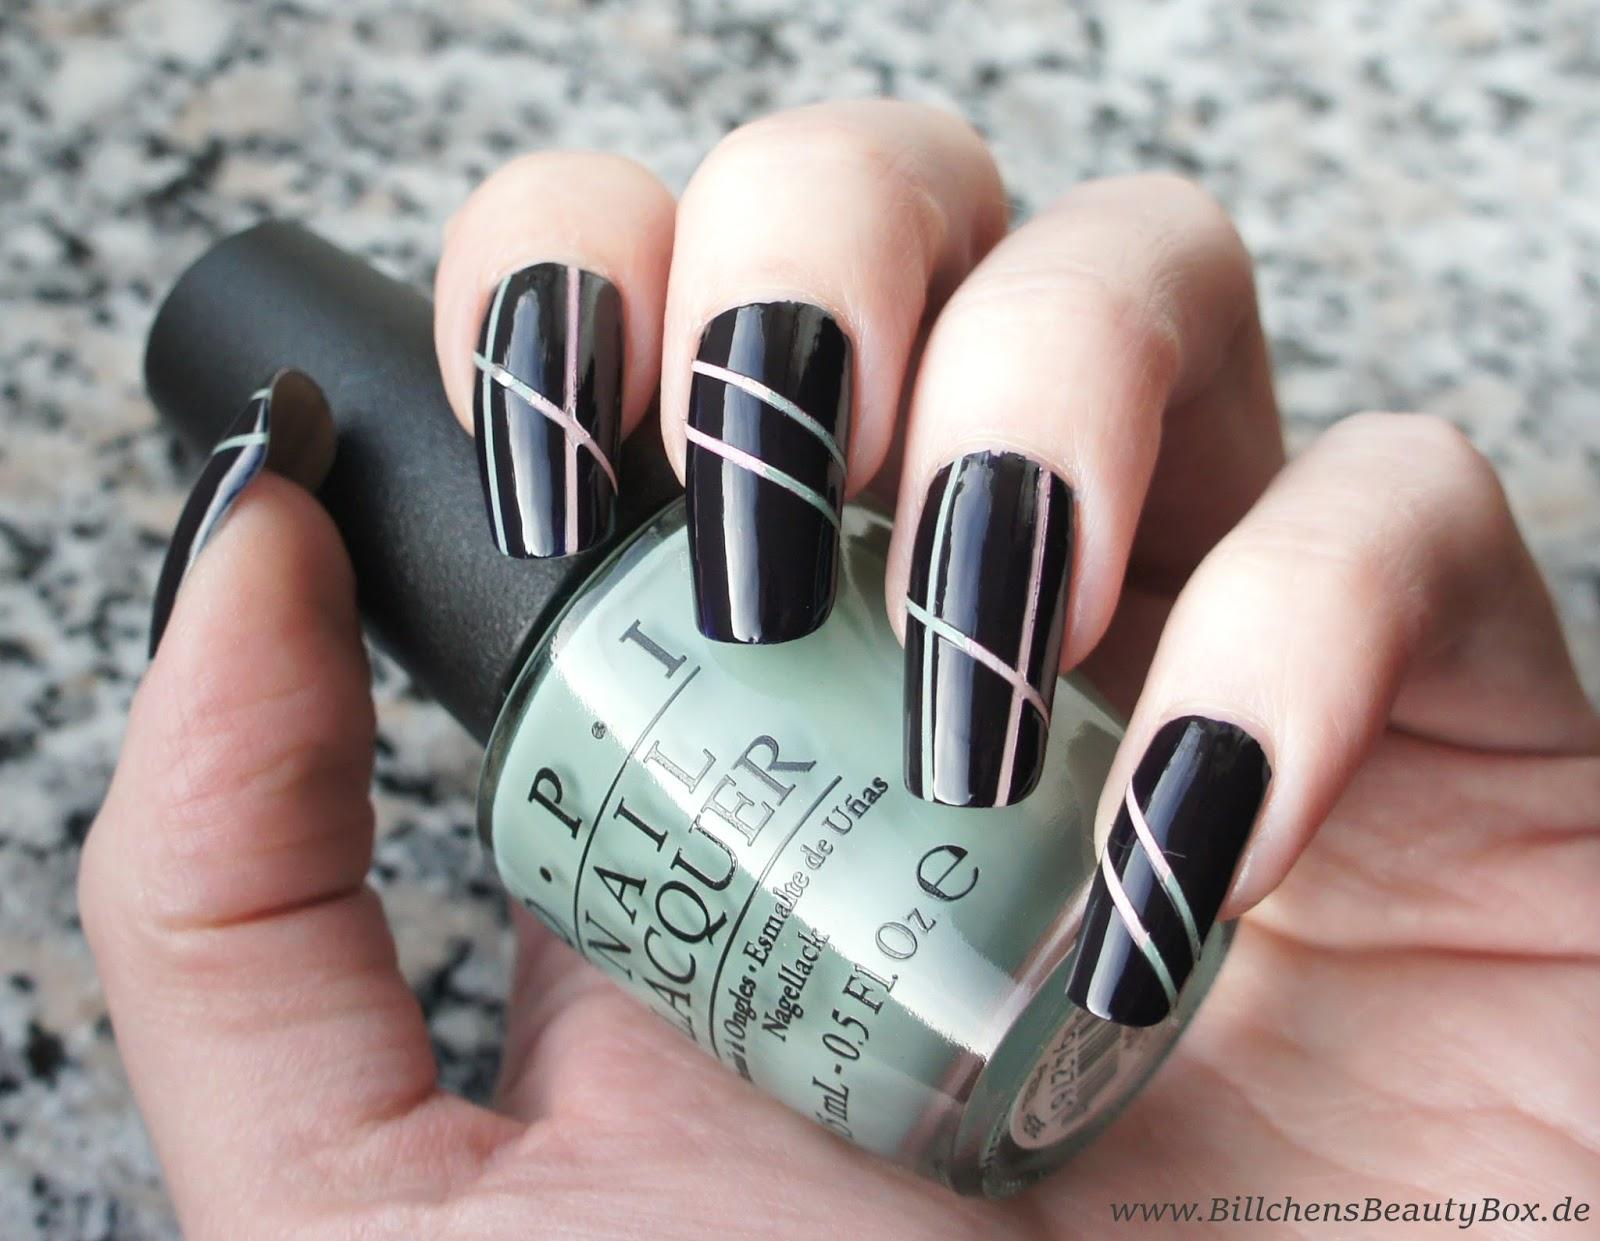 http://www.billchensbeautybox.de/2015/02/blogparade-ready-set-polish-geometrie.html